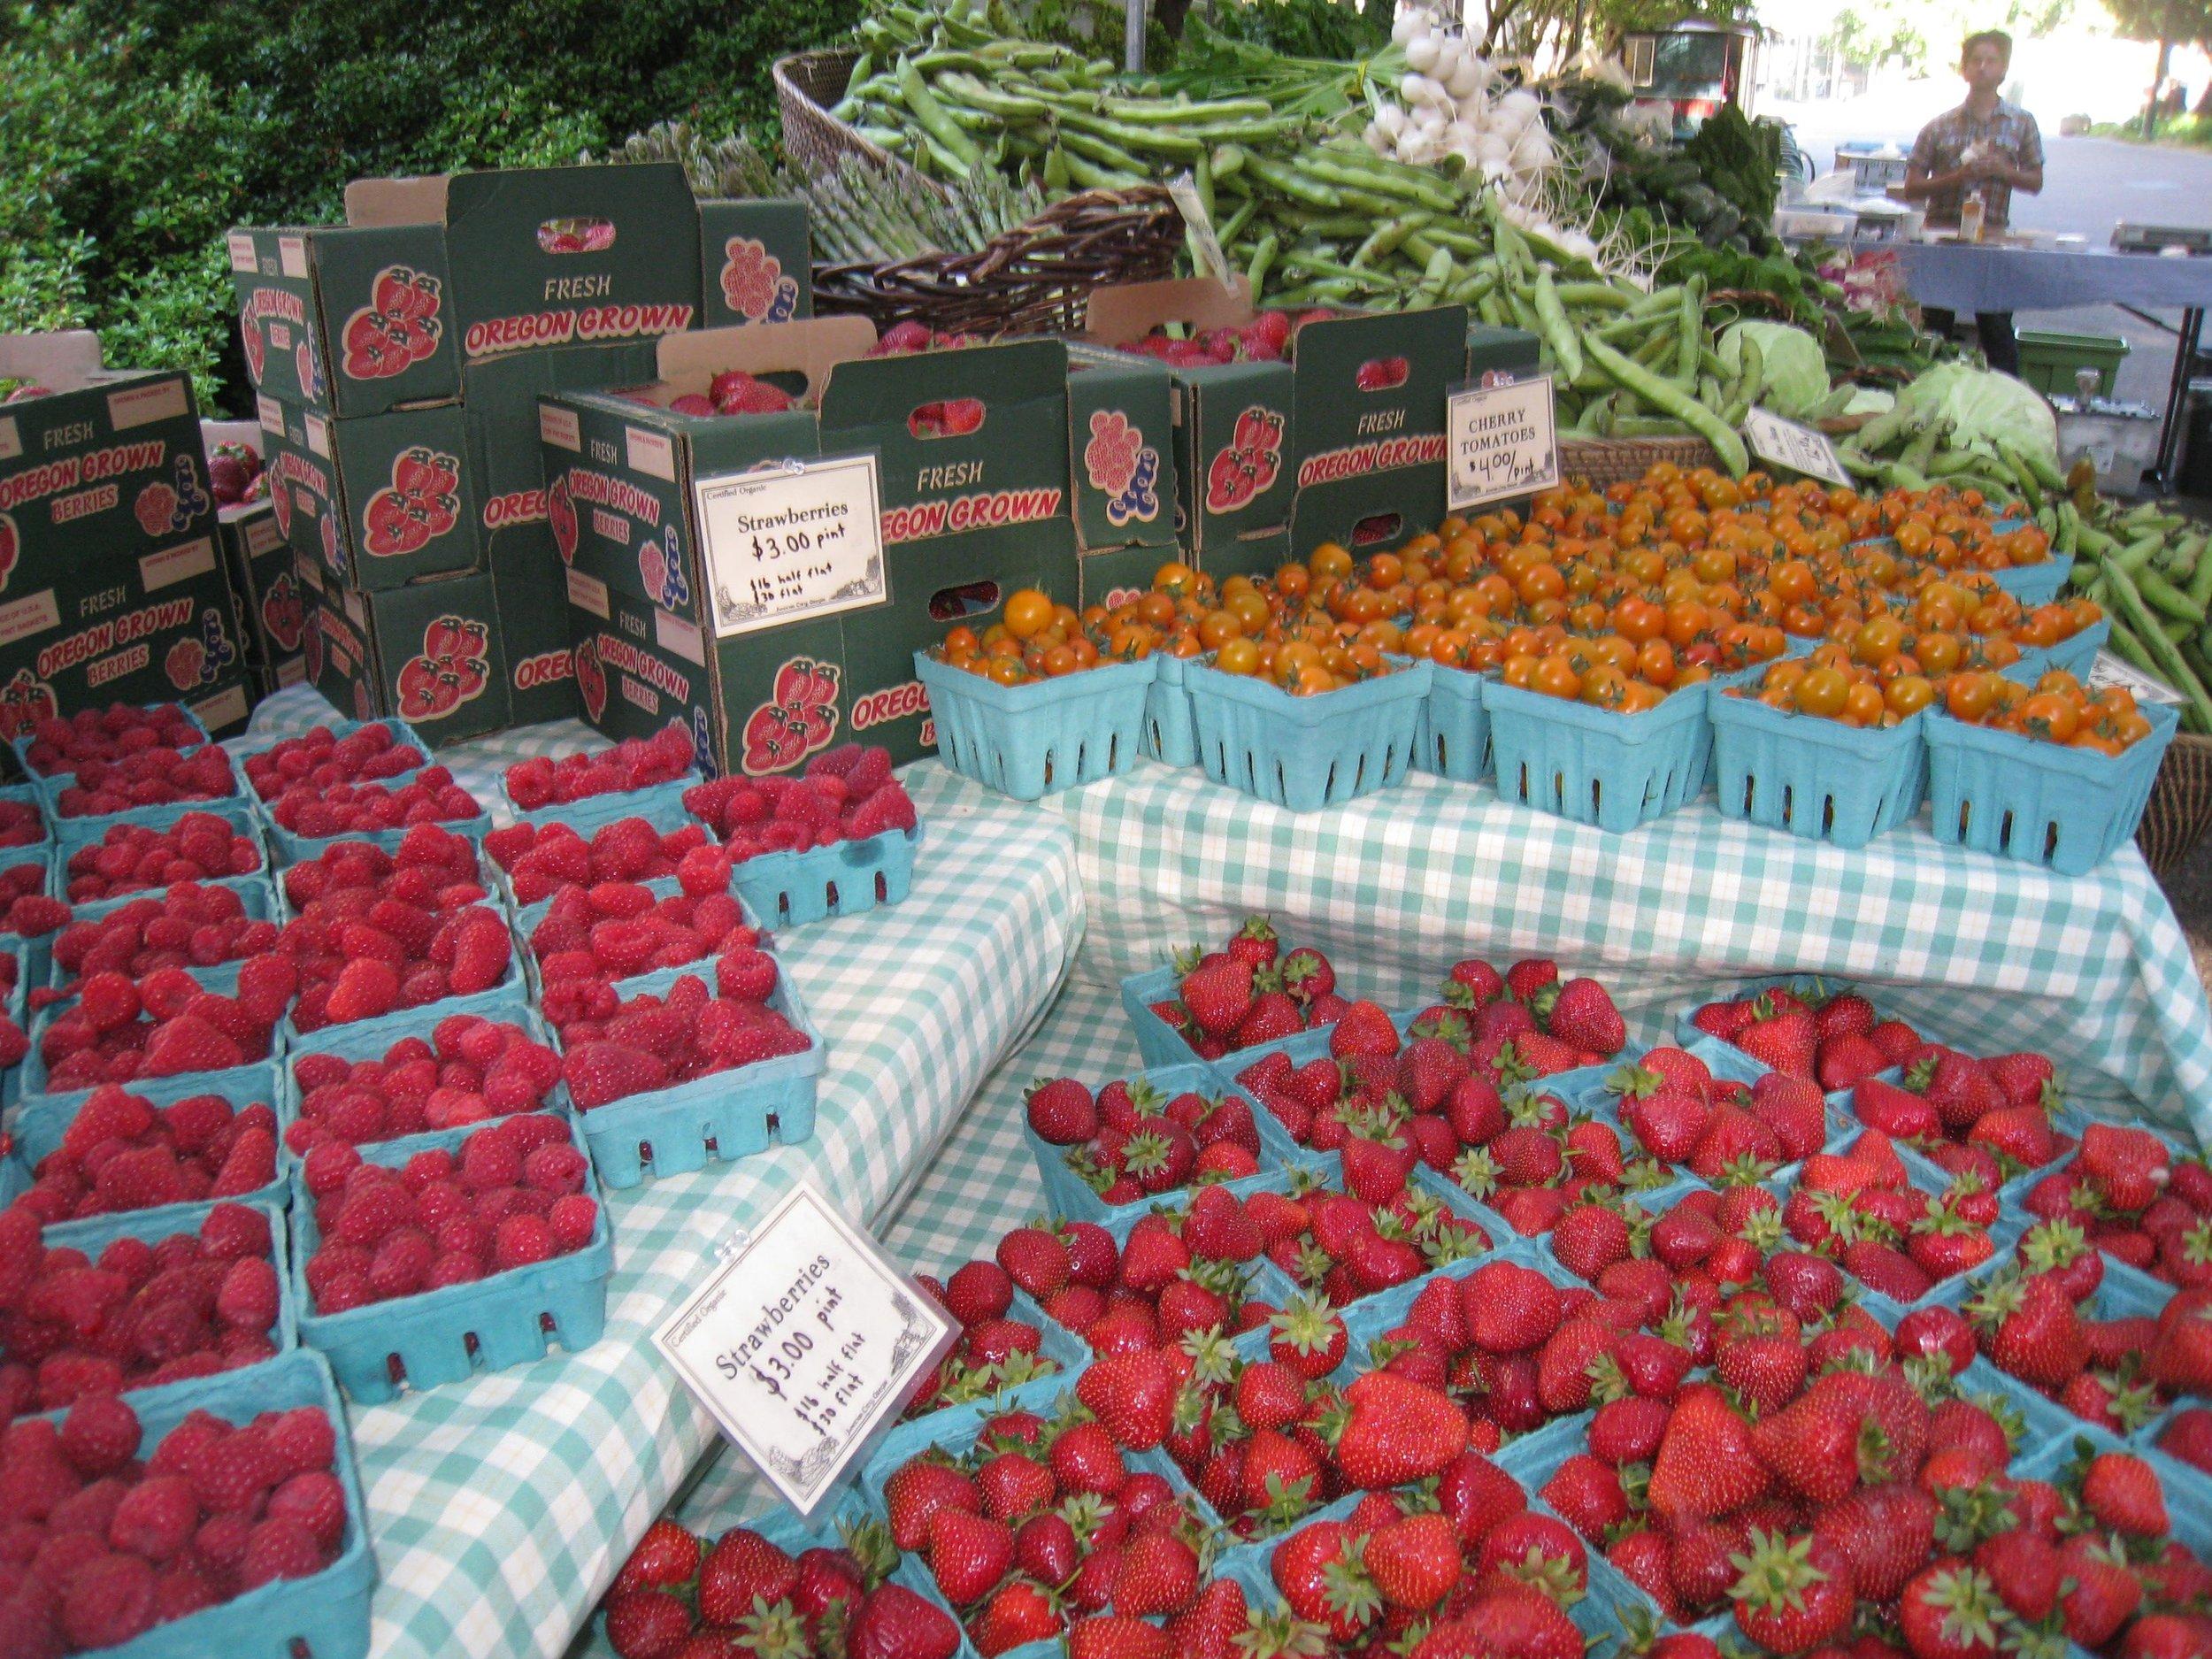 berries at market.jpg